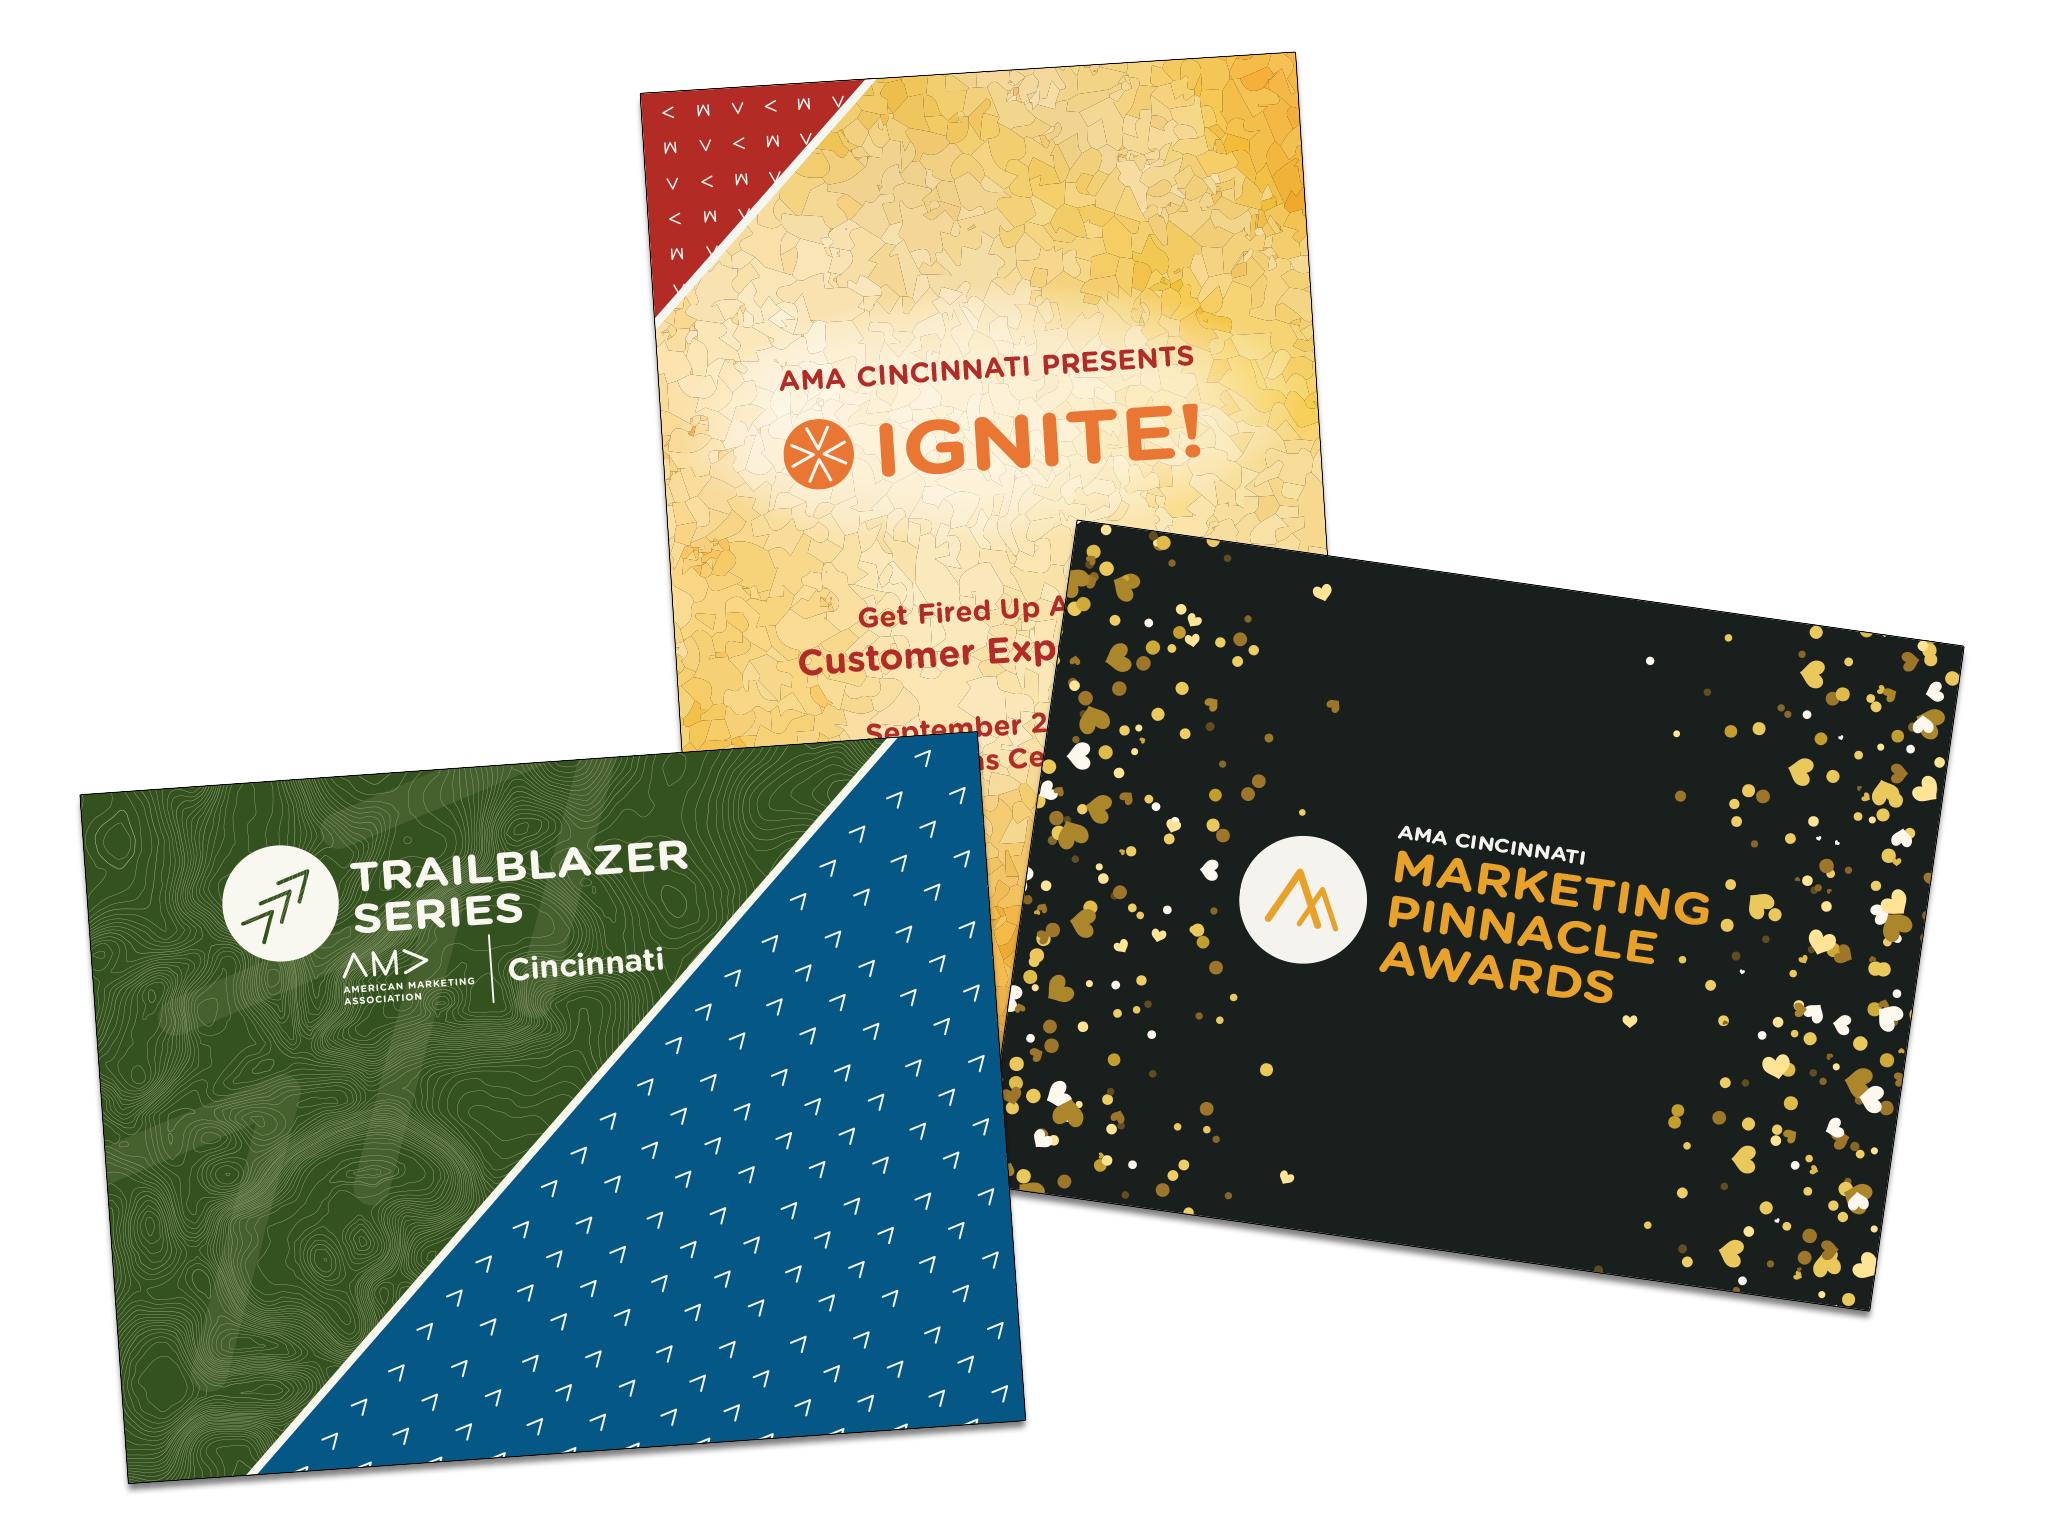 Ignite Conference, Marketing Pinnacle Awards, Trailblazer Series